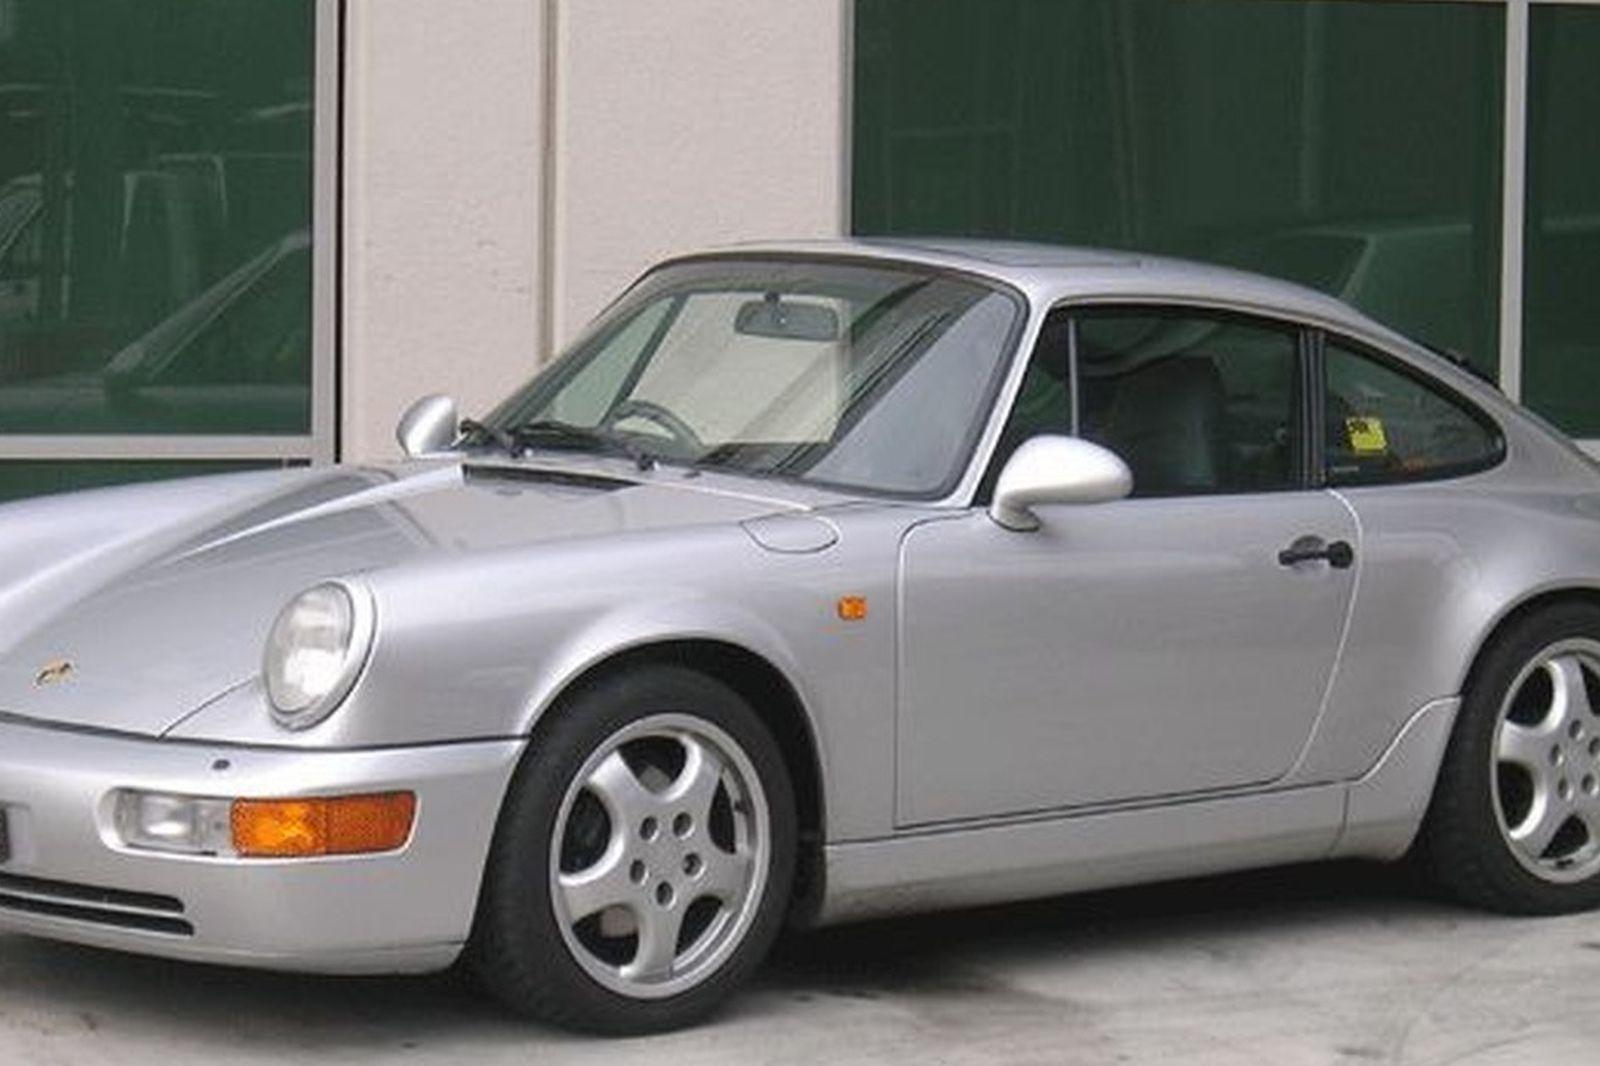 sold: porsche 911 carrera 4 coupe auctions - lot 7 - shannons